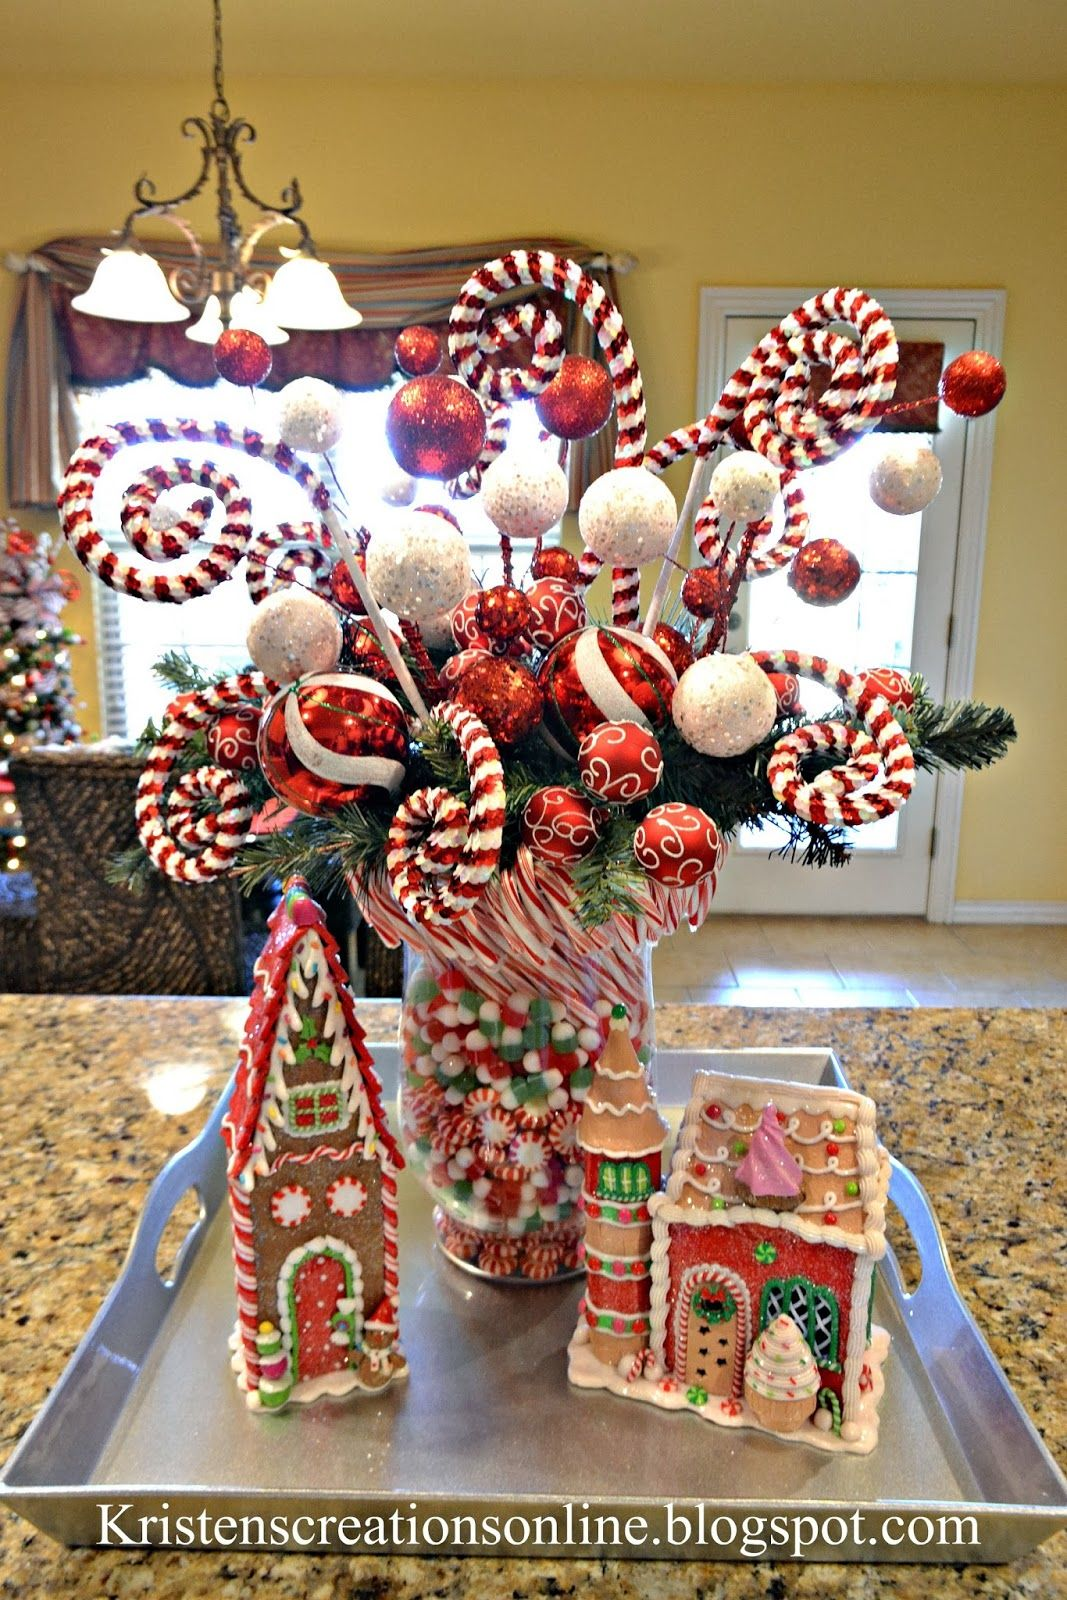 Candy Cane Decorations Pinterest Kristen's Creations Christmas Home Tour  Decorations  Pinterest